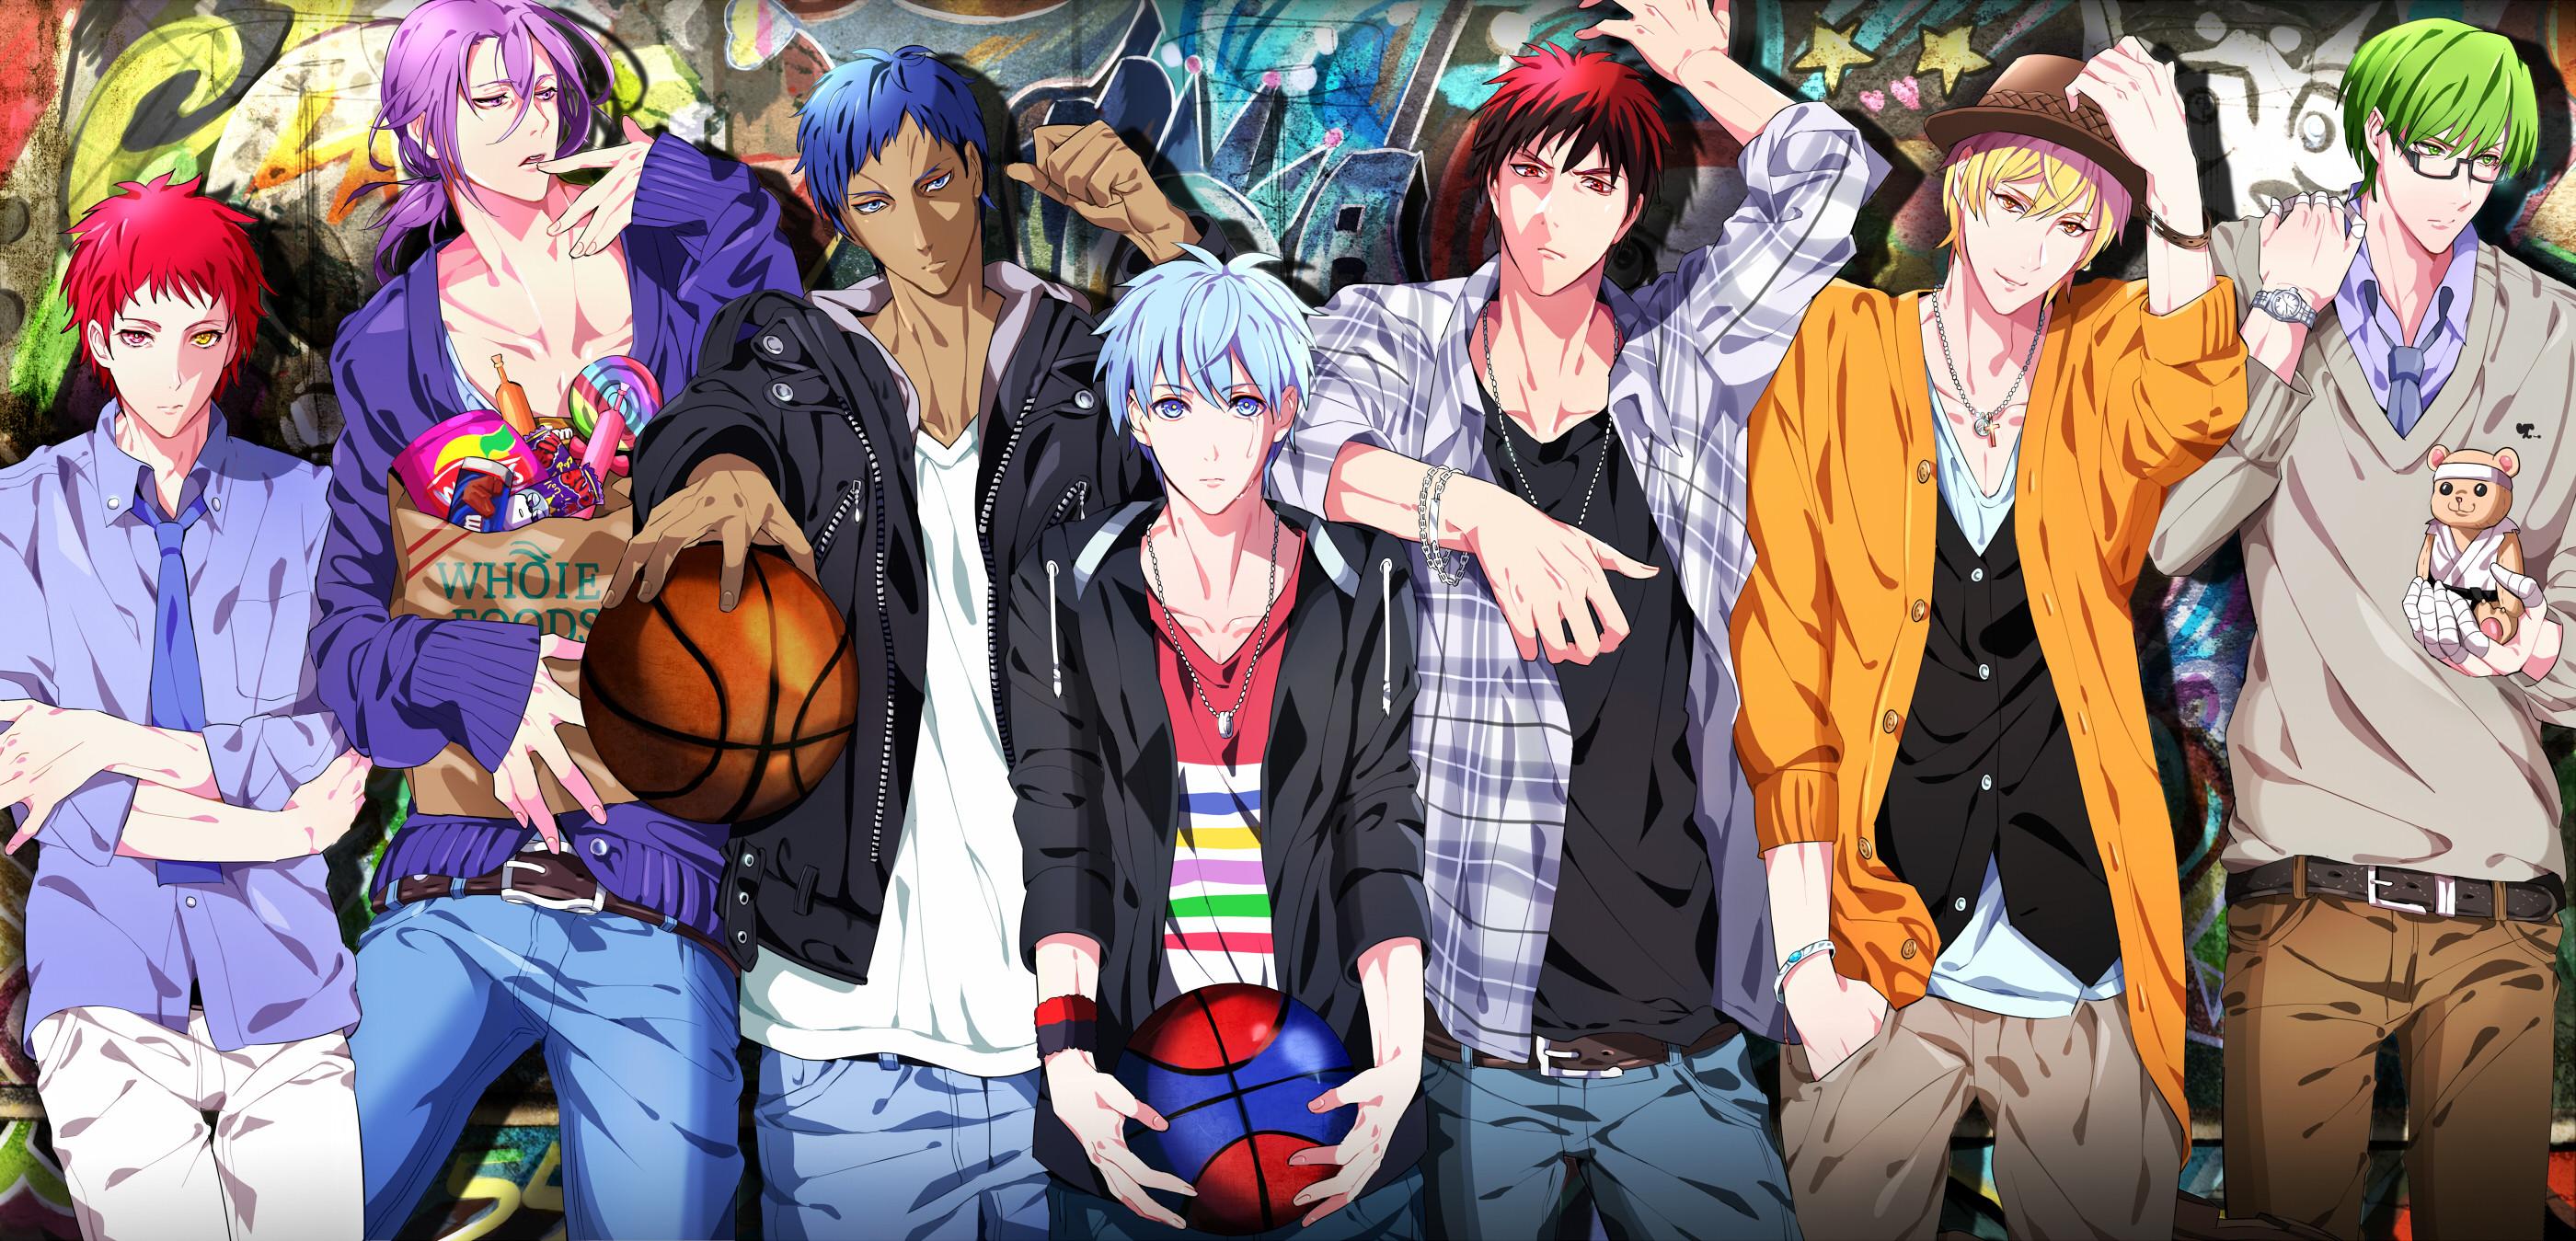 Kuroko Basketball Wallpaper 66 images 2800x1349